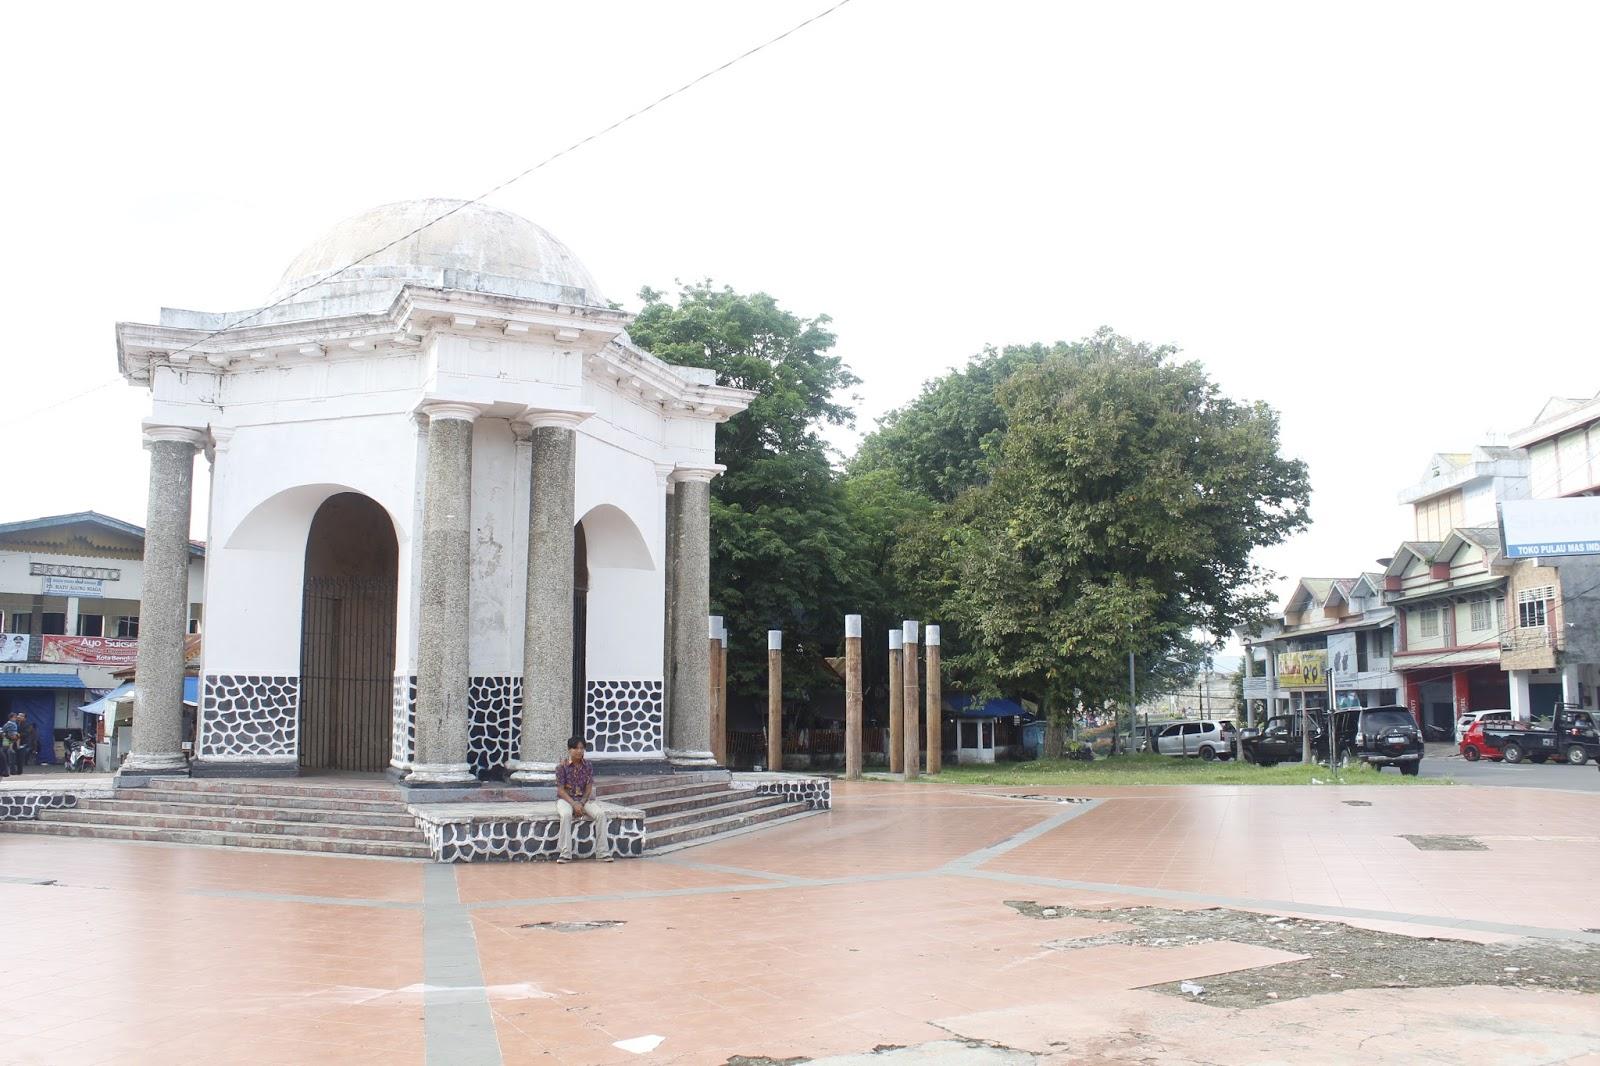 Marisakhairiyani Juli 2016 Tugu Tomas Parr Monument Salah Satu Bangunan